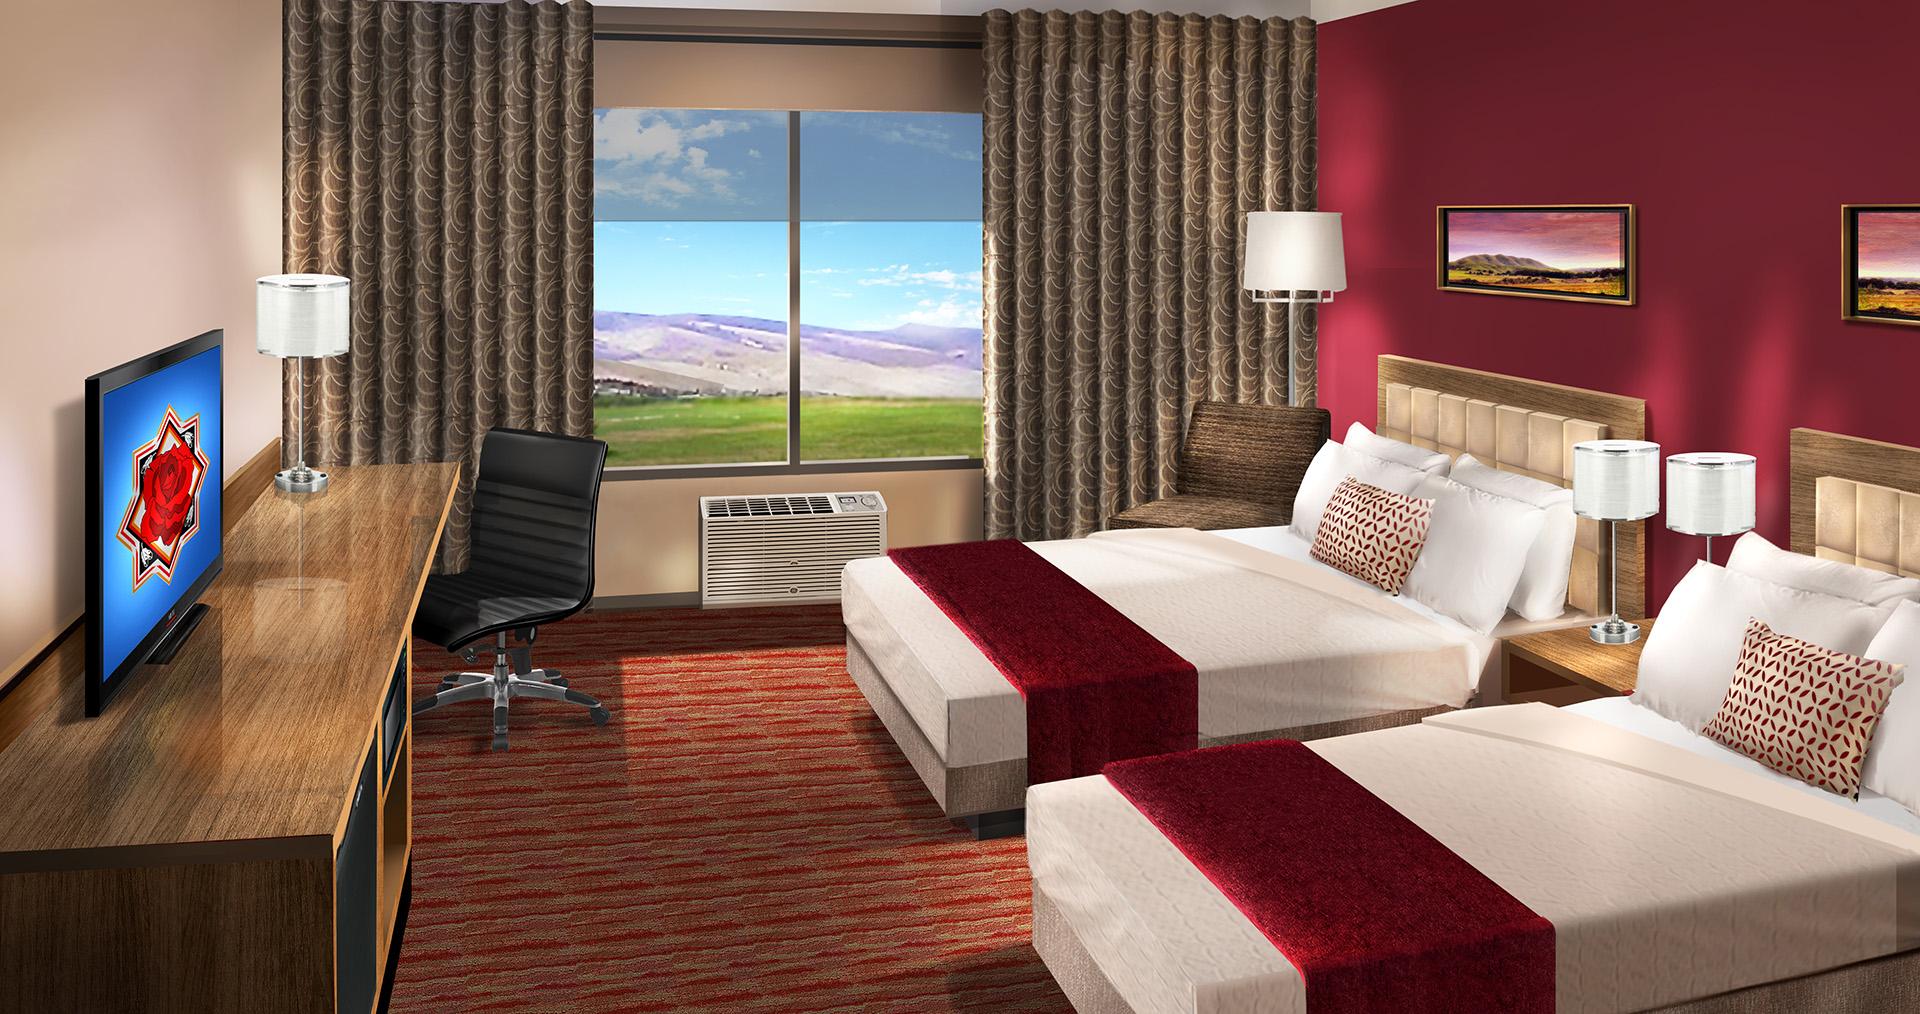 Shoshone Rose Casino and Hotel image 0